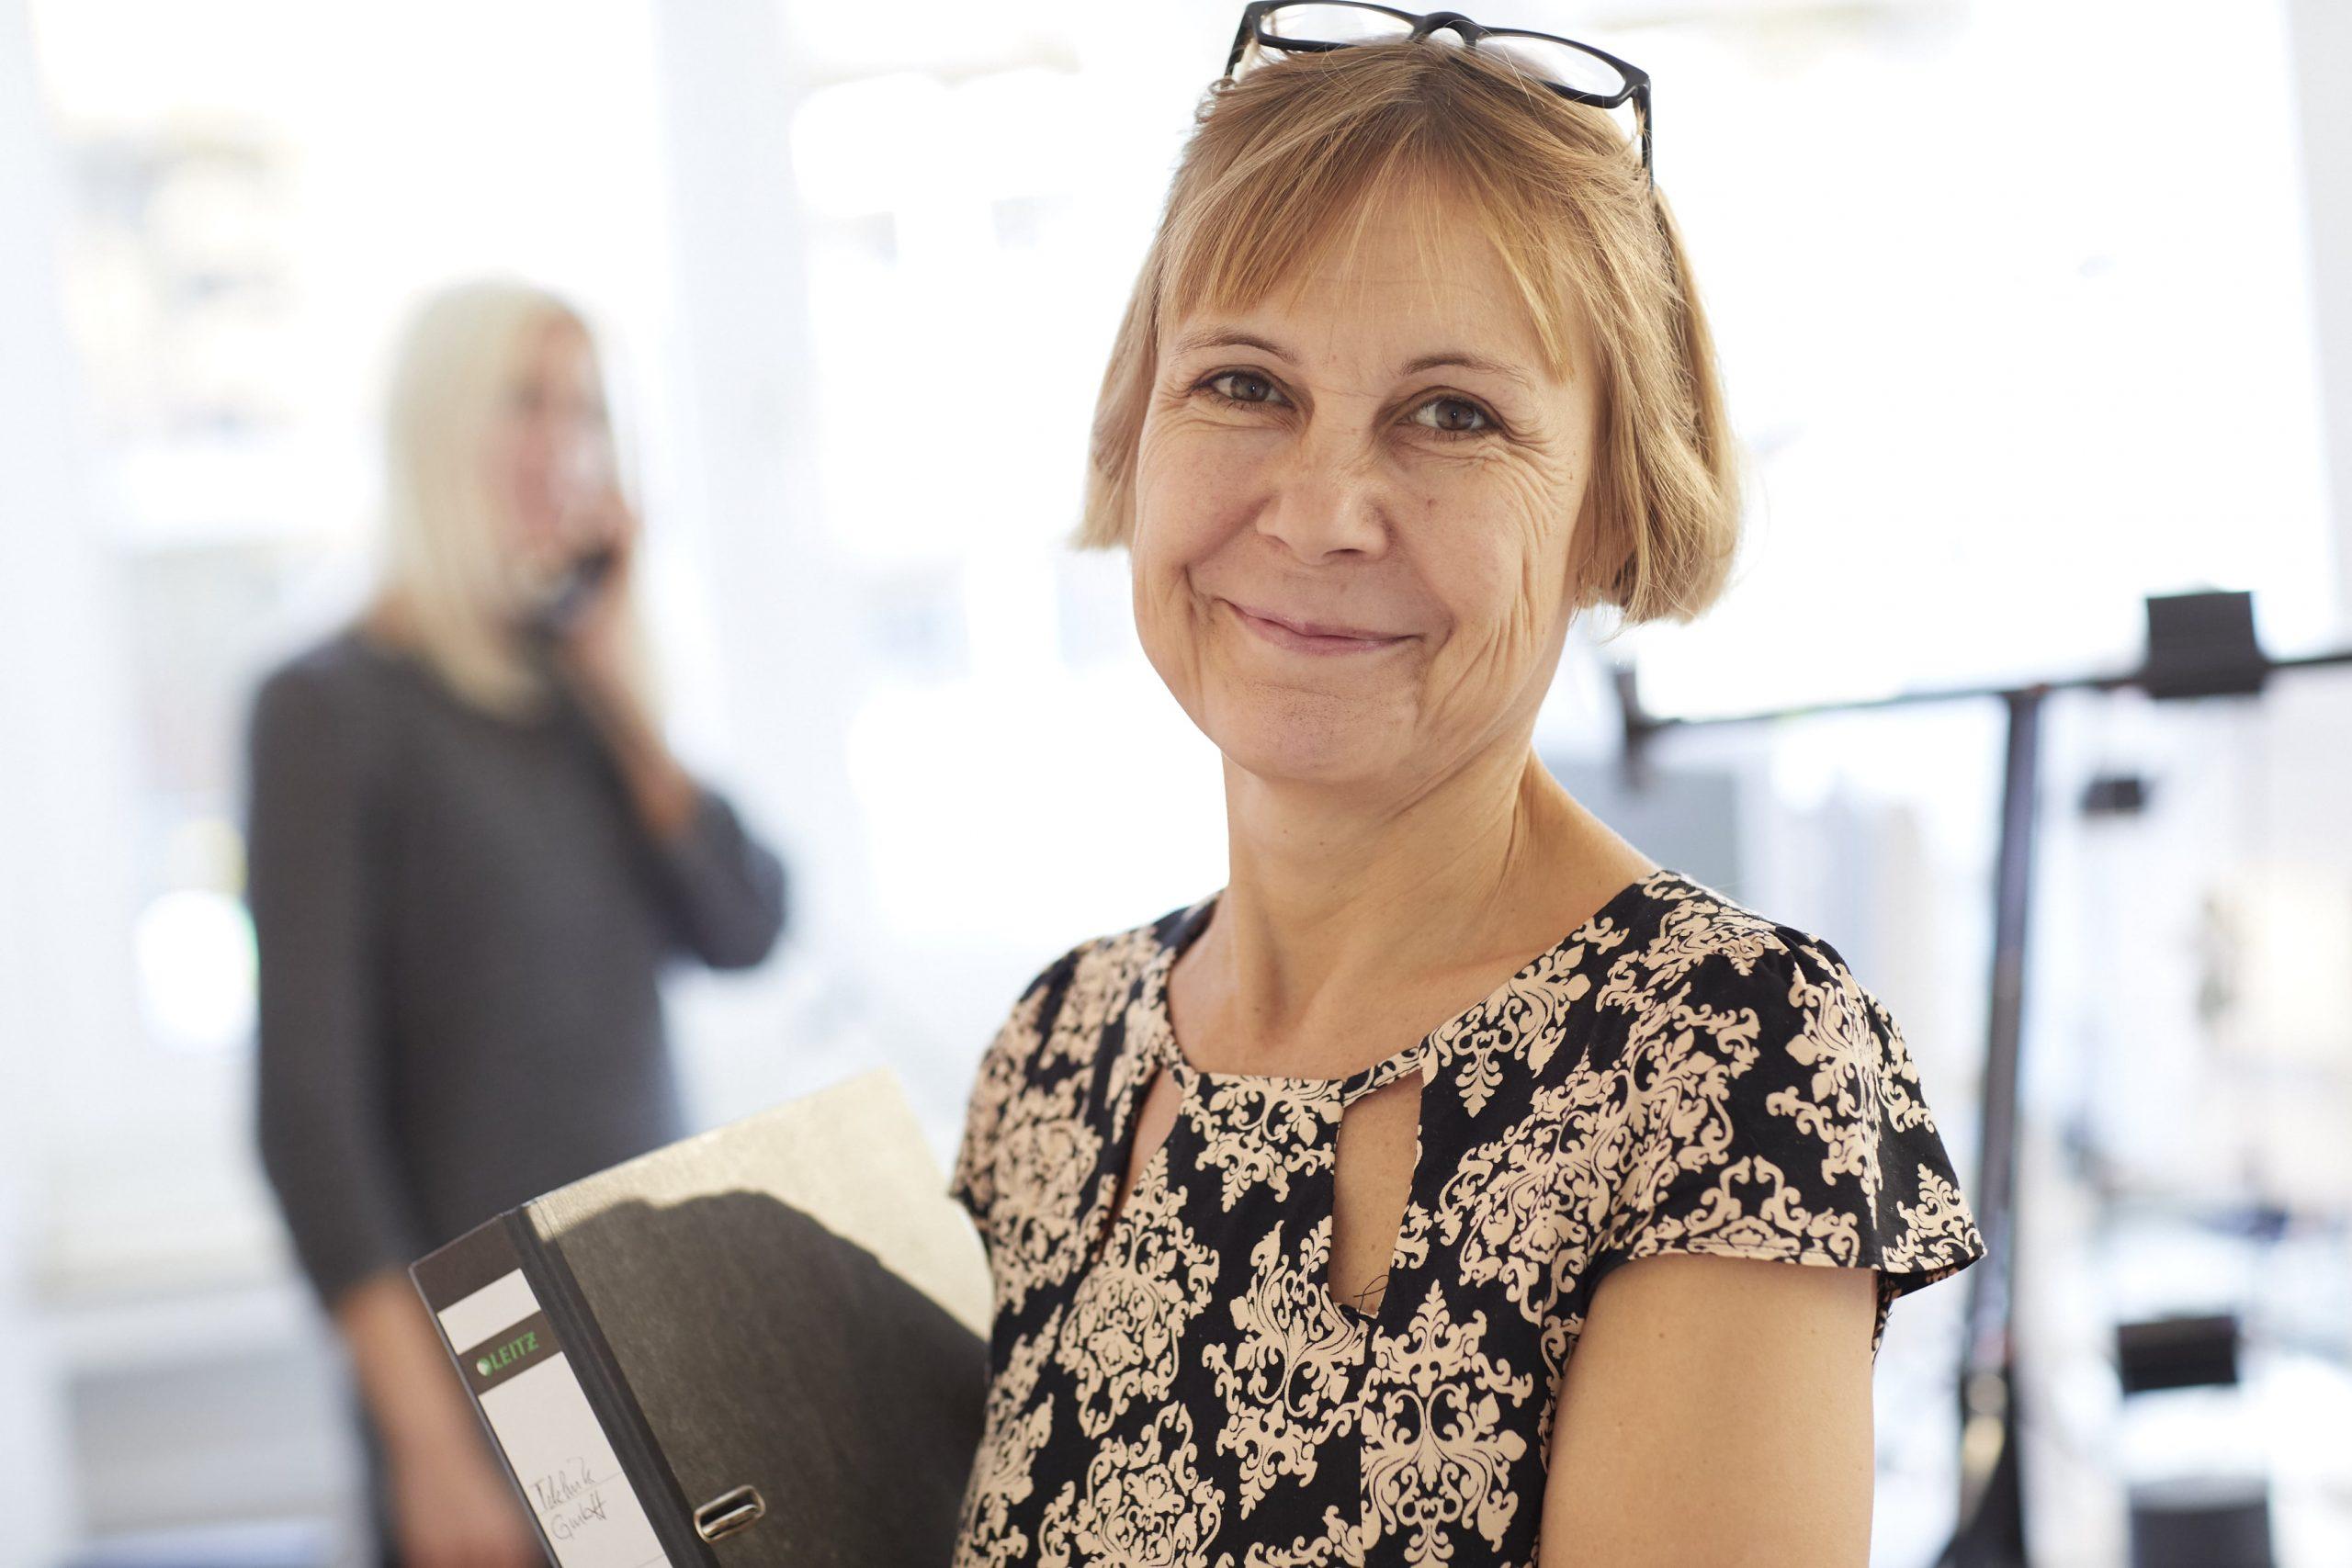 Anke Tenberken - Steuerberater Eggeling und Partner in Düsseldorf